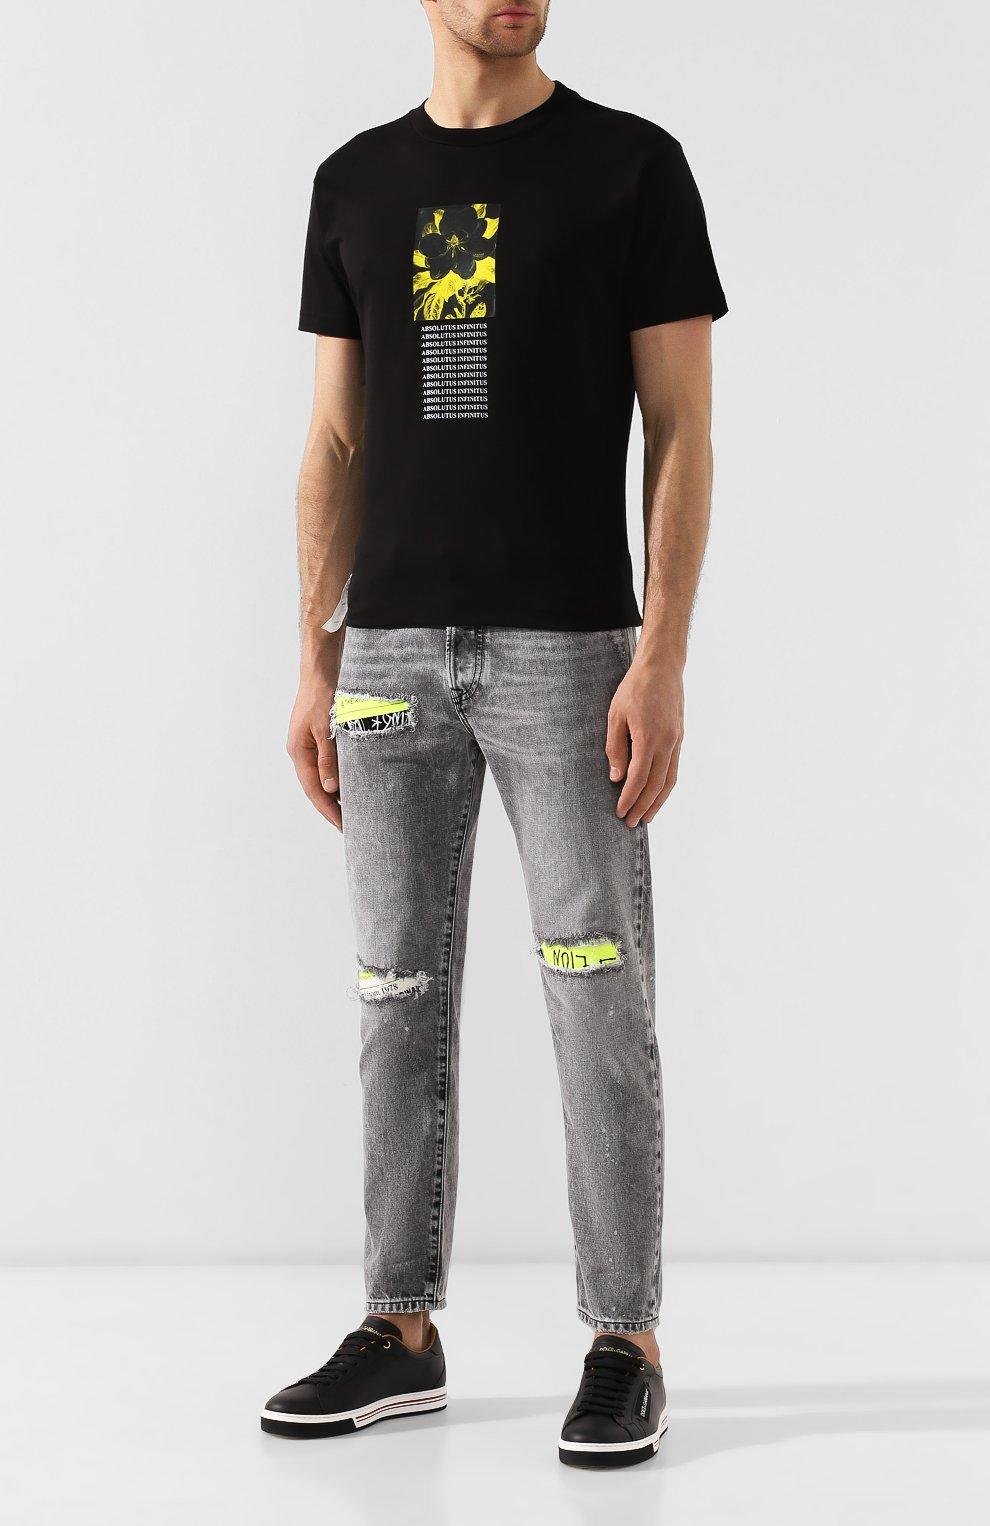 Хлопковая футболка Diesel черная   Фото №2